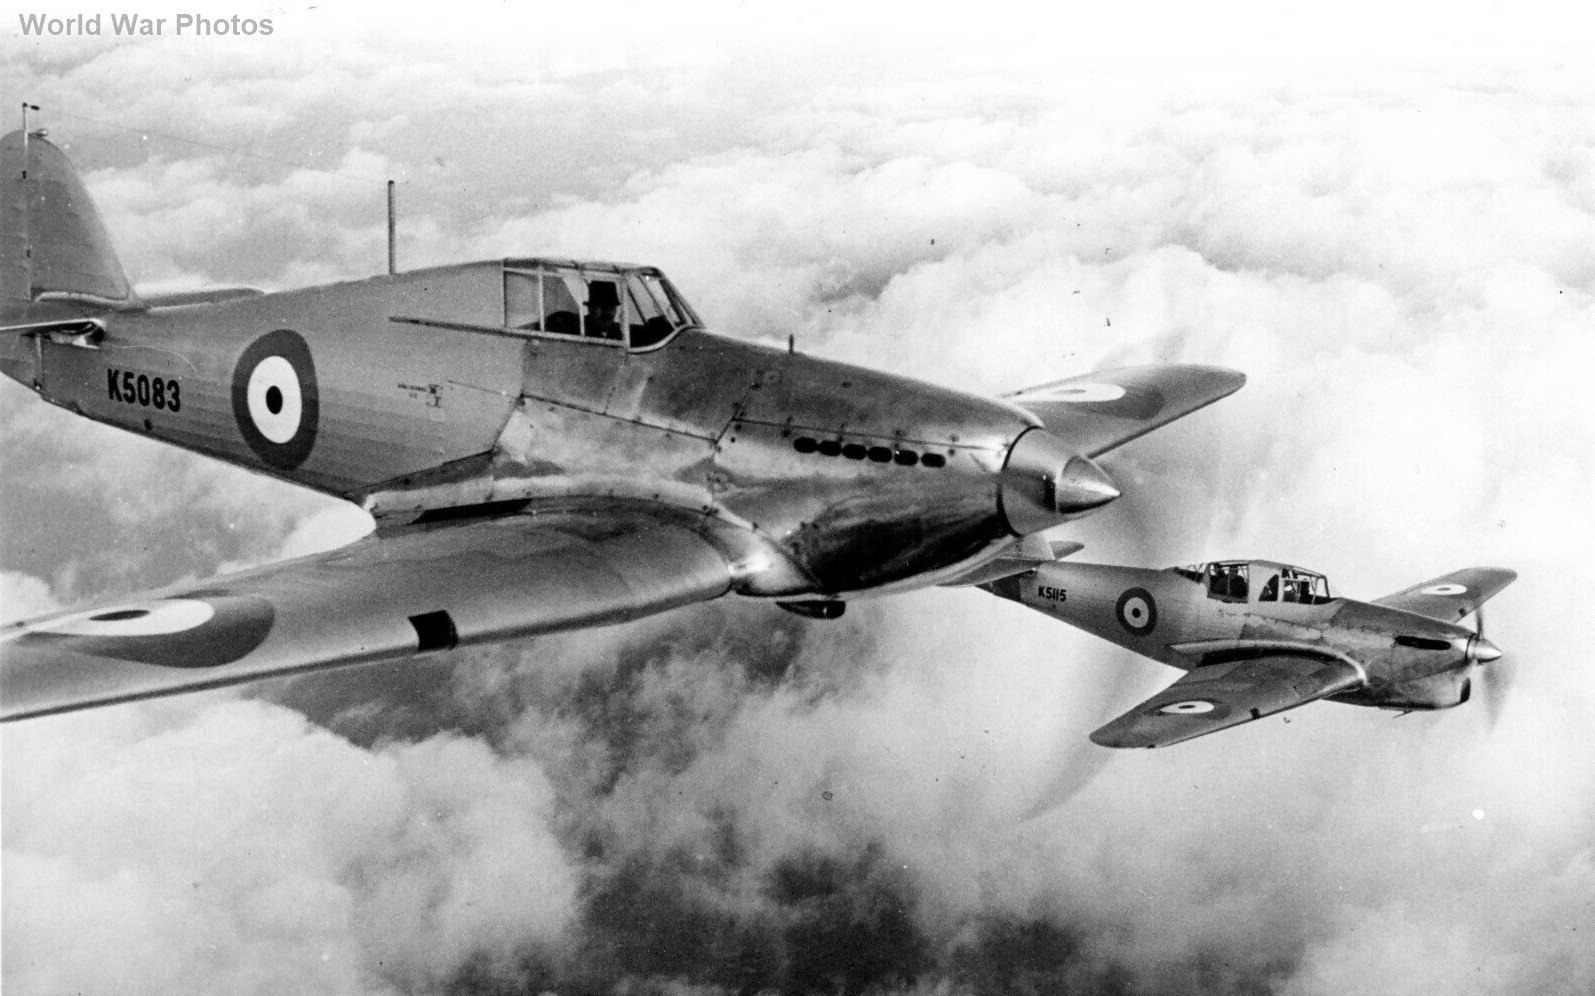 Hawker Hurricane K5083 and Henley